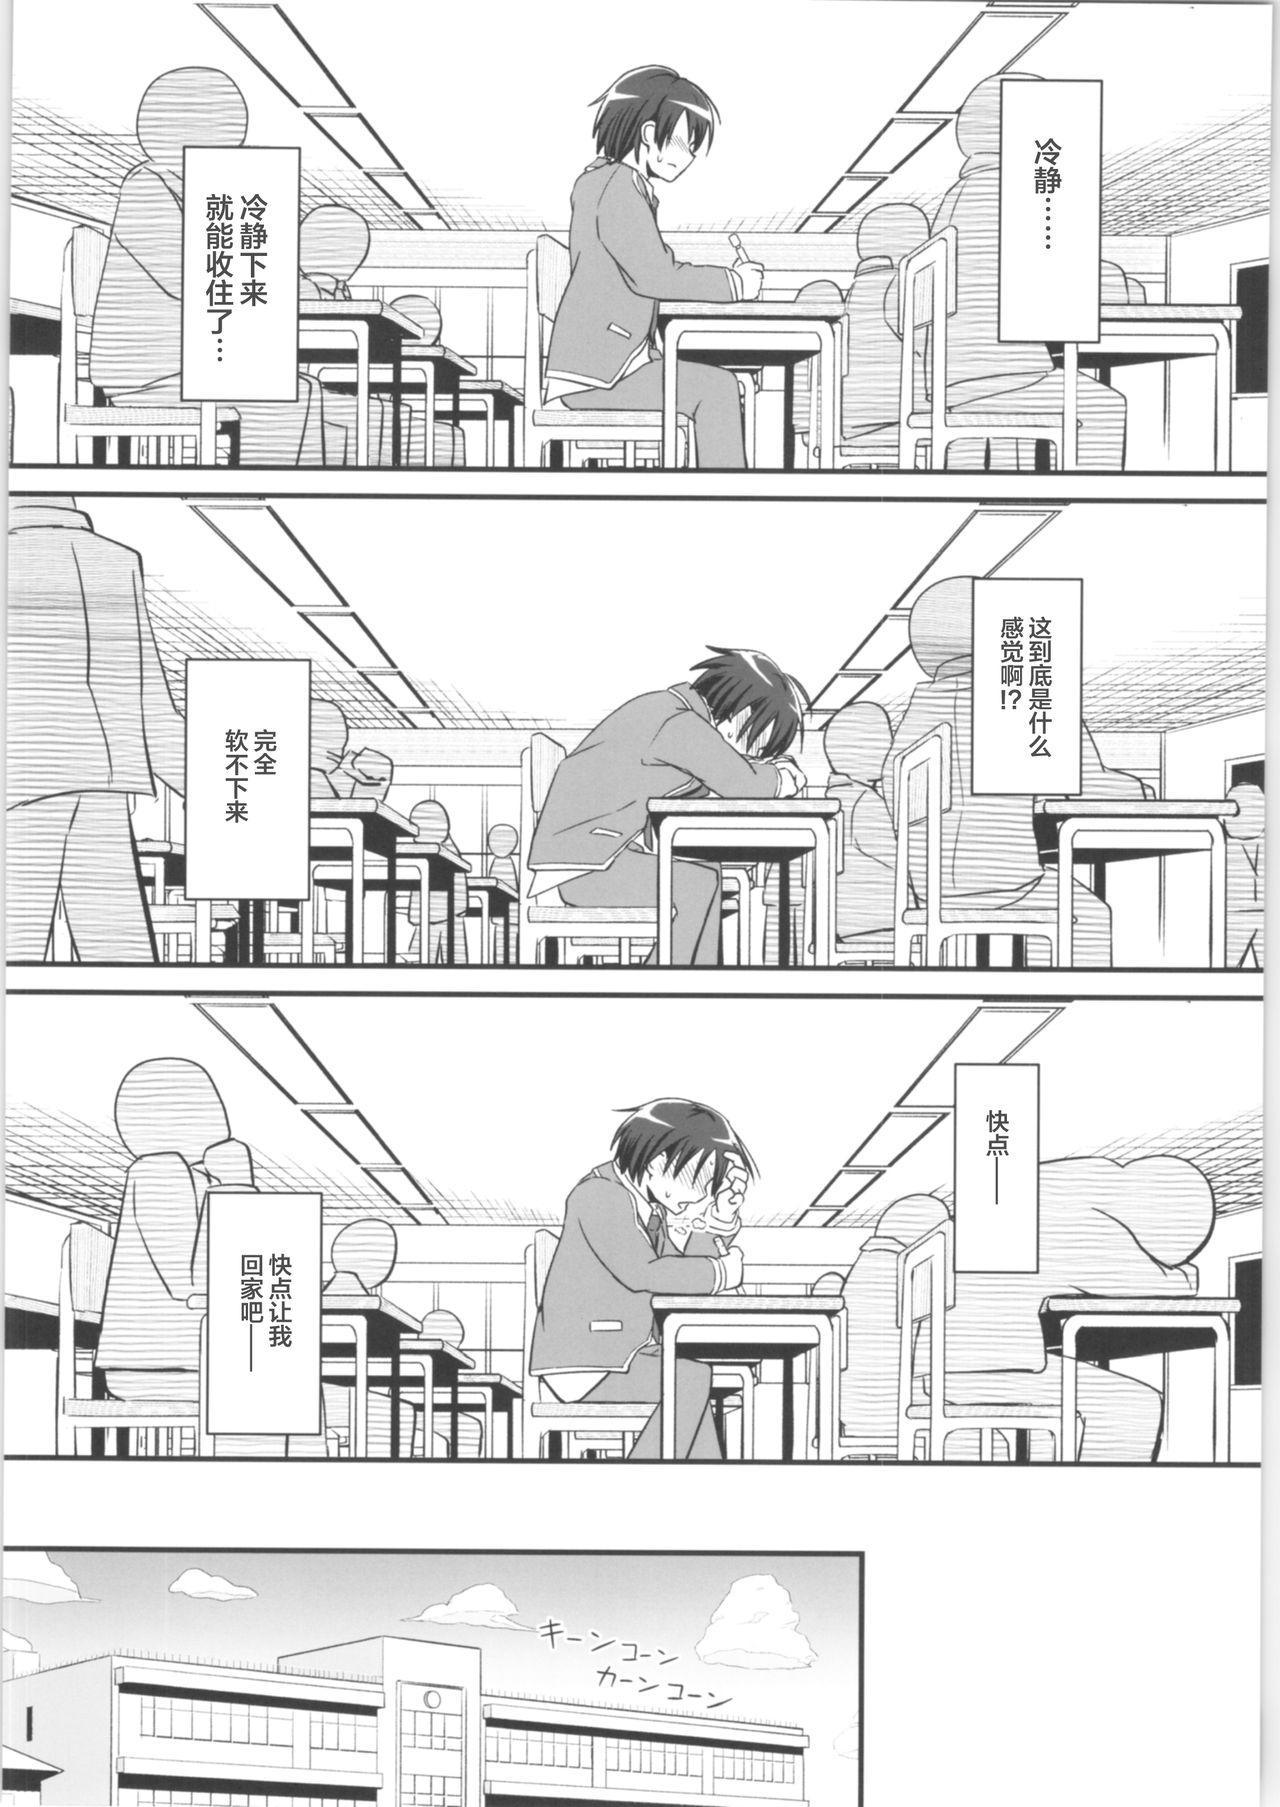 [Umari-ya (D-2)] Kiriko Route Another #02 ~Shitagi Josou Jii Kyouyou Hen~ (Sword Art Online)[Chinese]【不可视汉化】 7